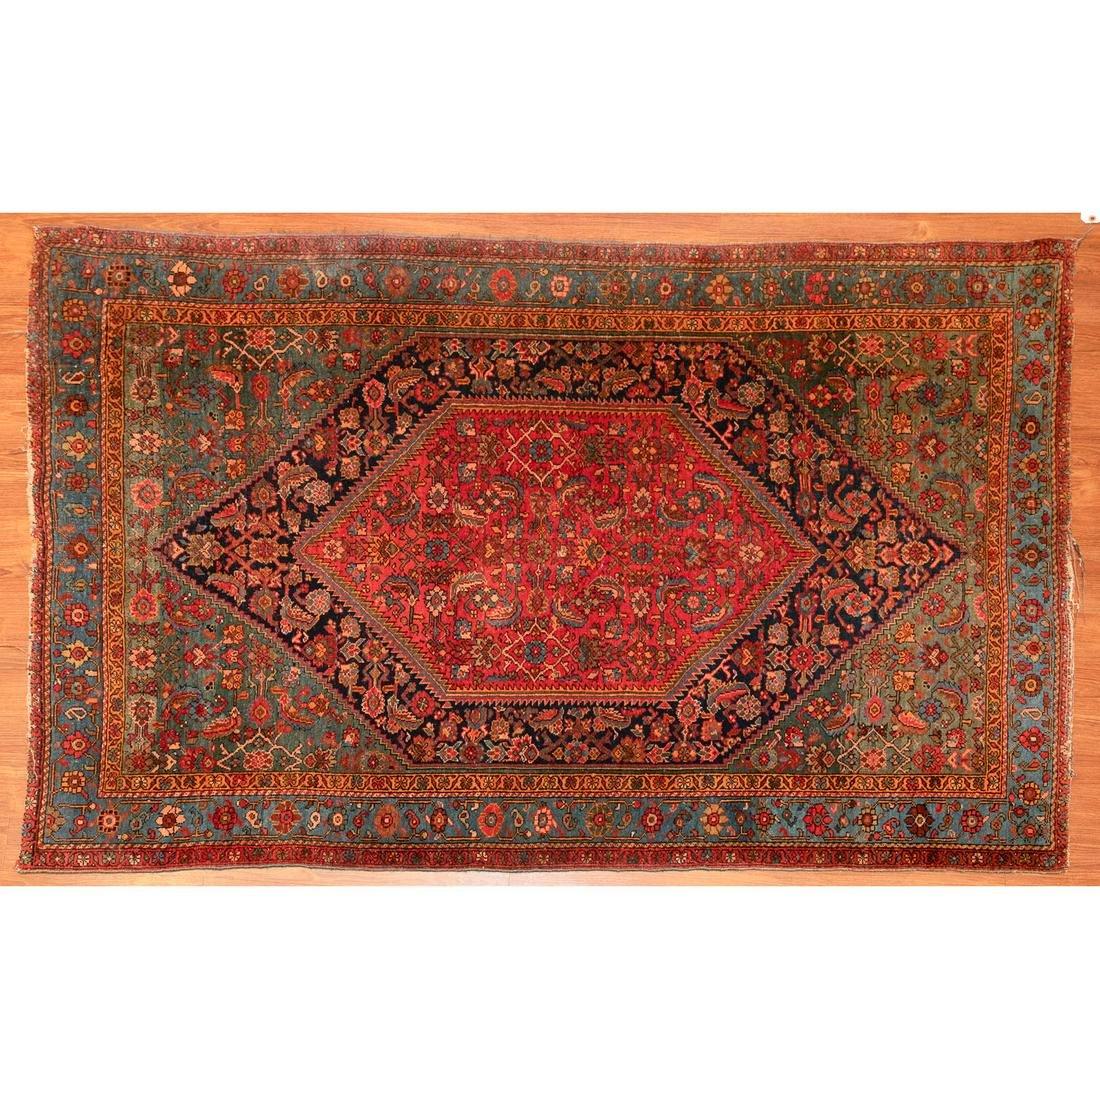 Antique Bijar Rug, Persia, 4.3 x 6.3